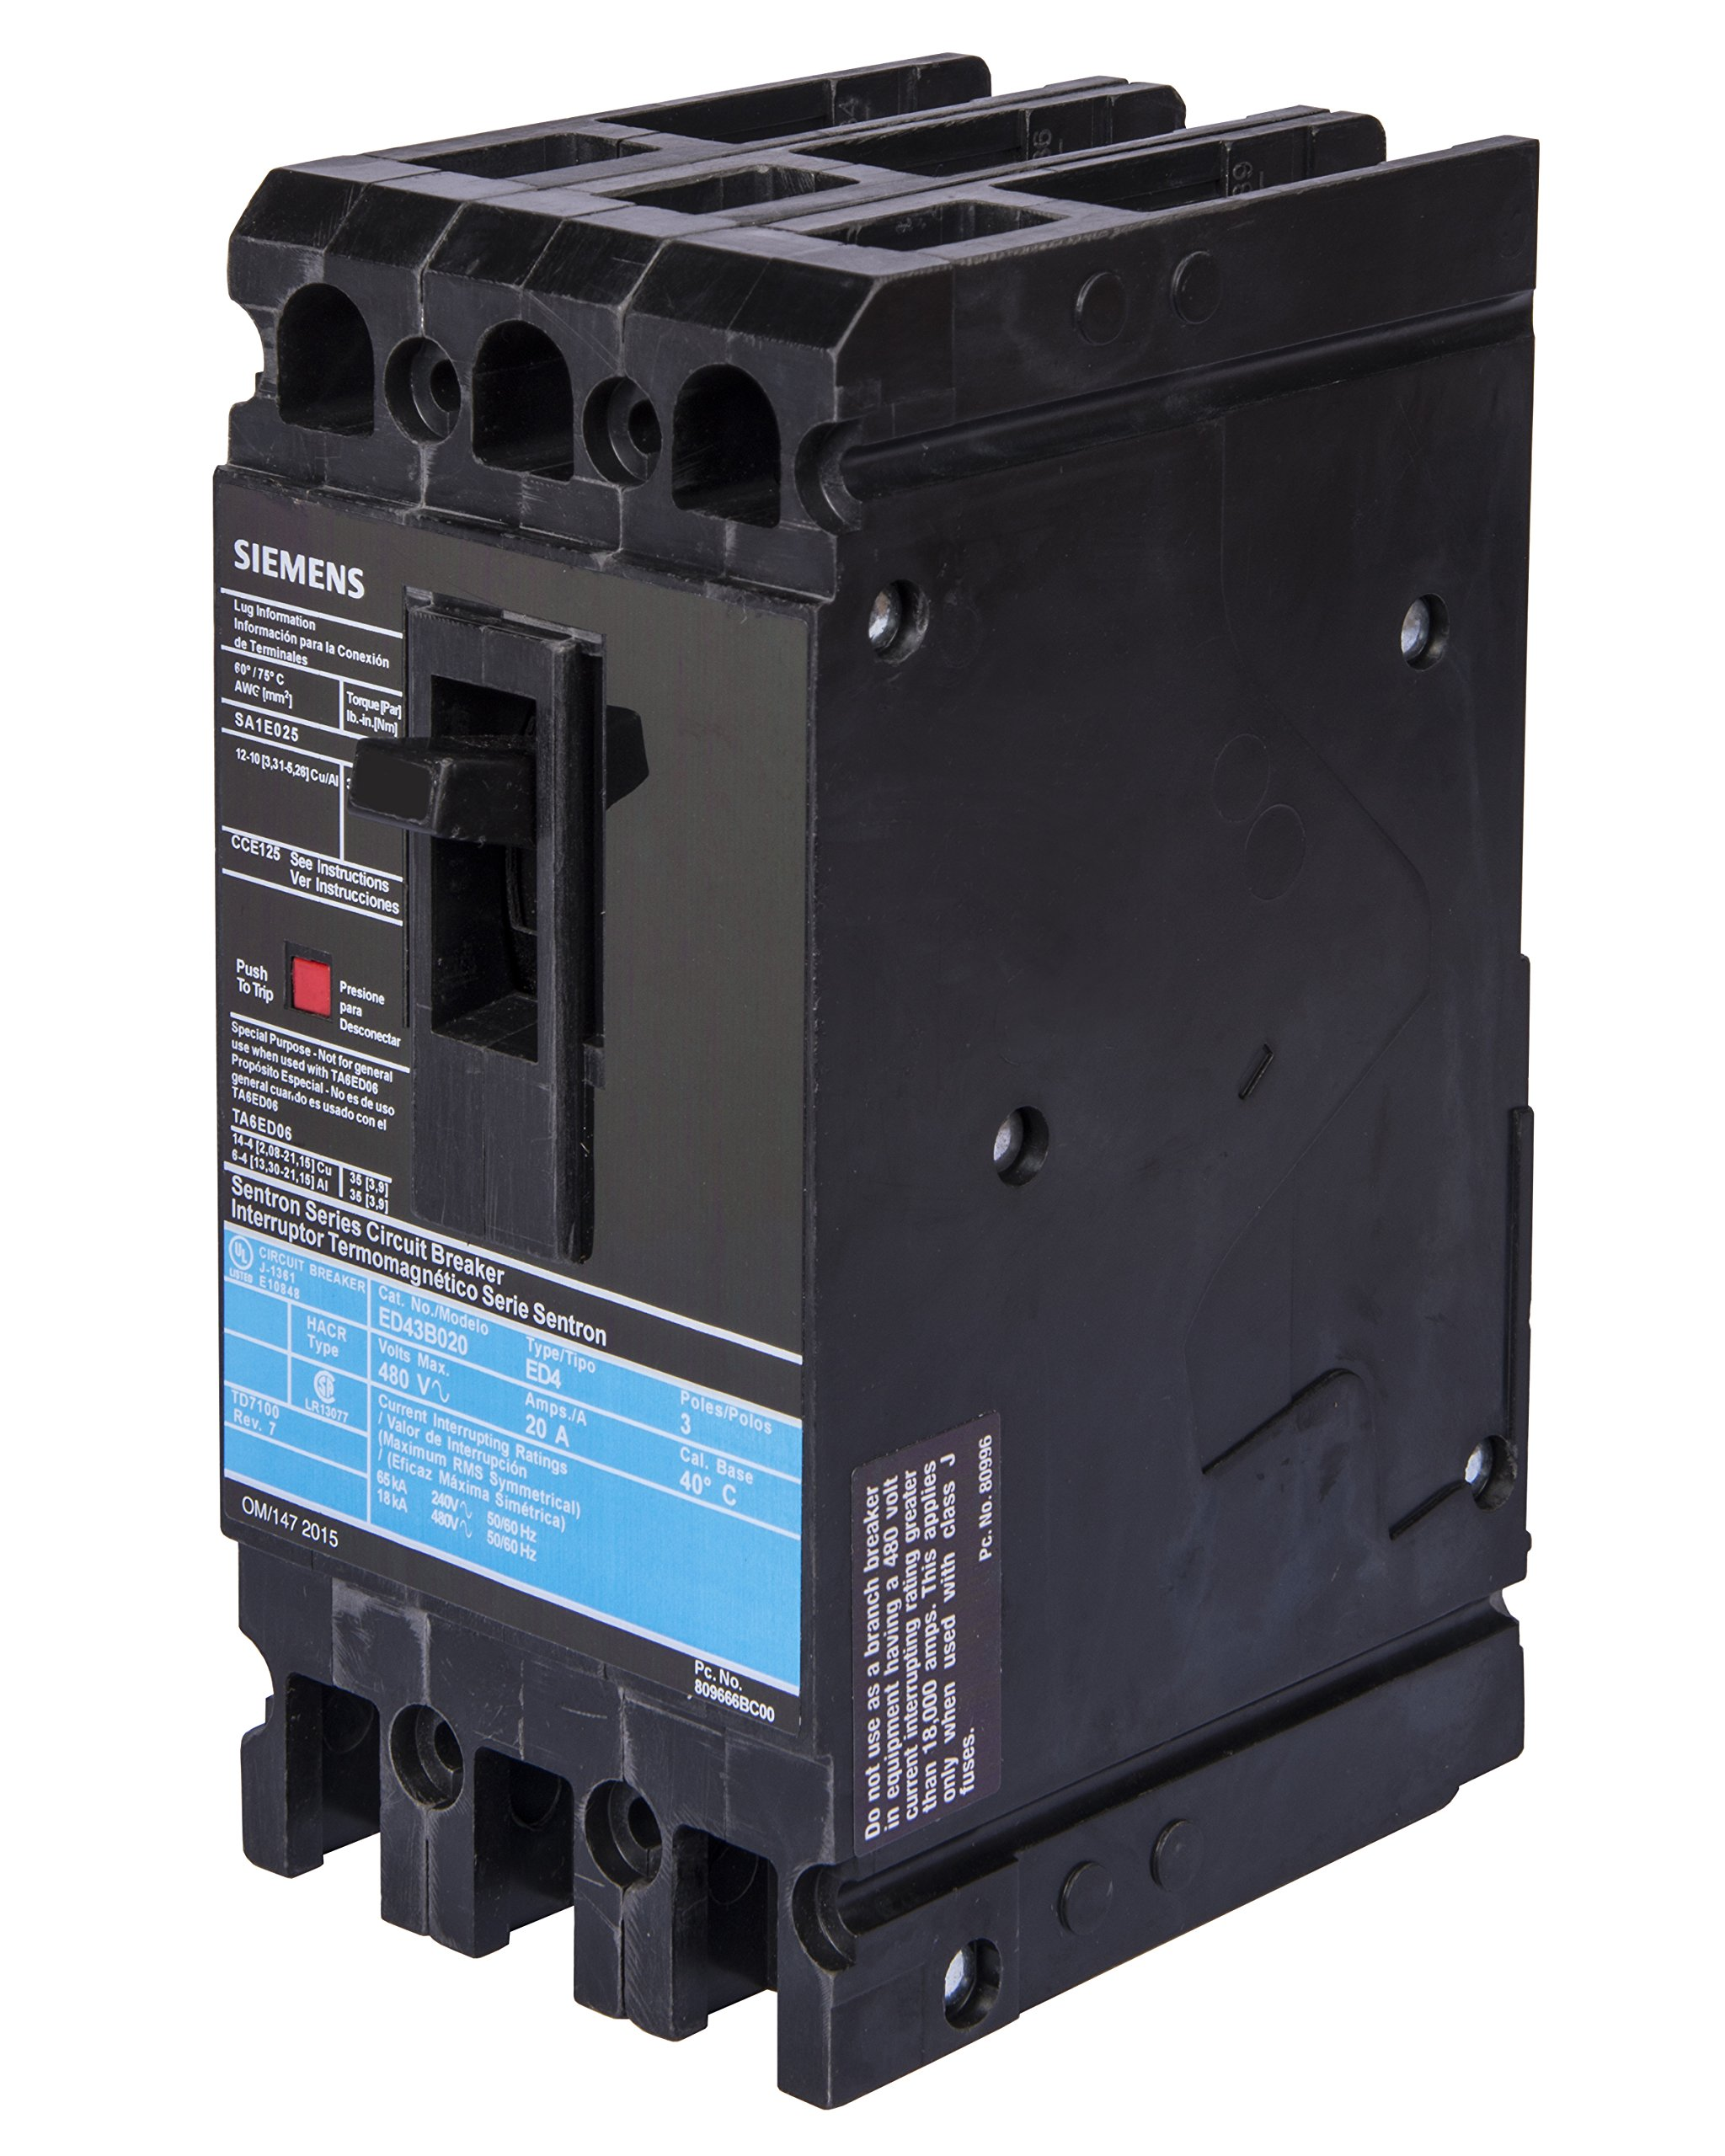 Siemens ED43B060 Circuit Breaker, Type ED4, 60 Amp, 3 Pole